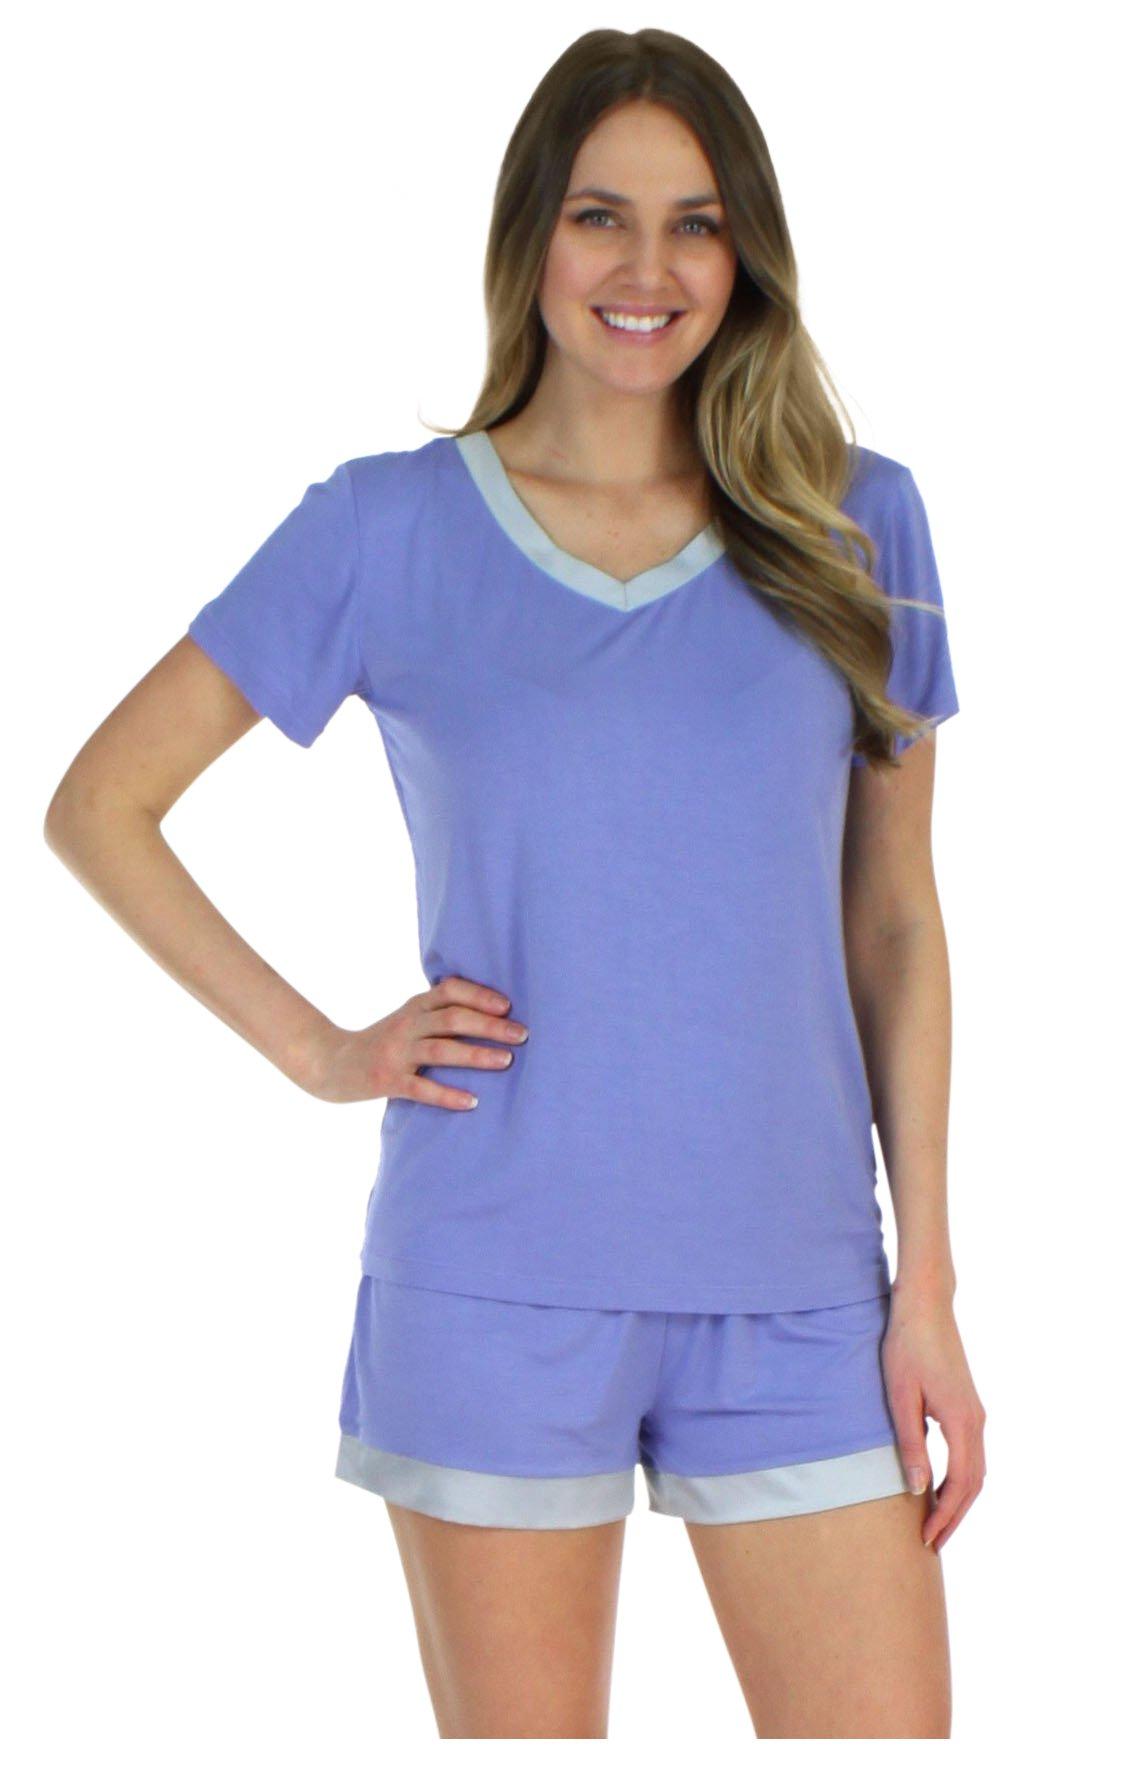 Pajama Heaven Women's Sleepwear Bamboo Jersey V-Neck Top and Shorts Pajama Set with Satin Trim, Lavender (PHBJ1940-1024-LRG)